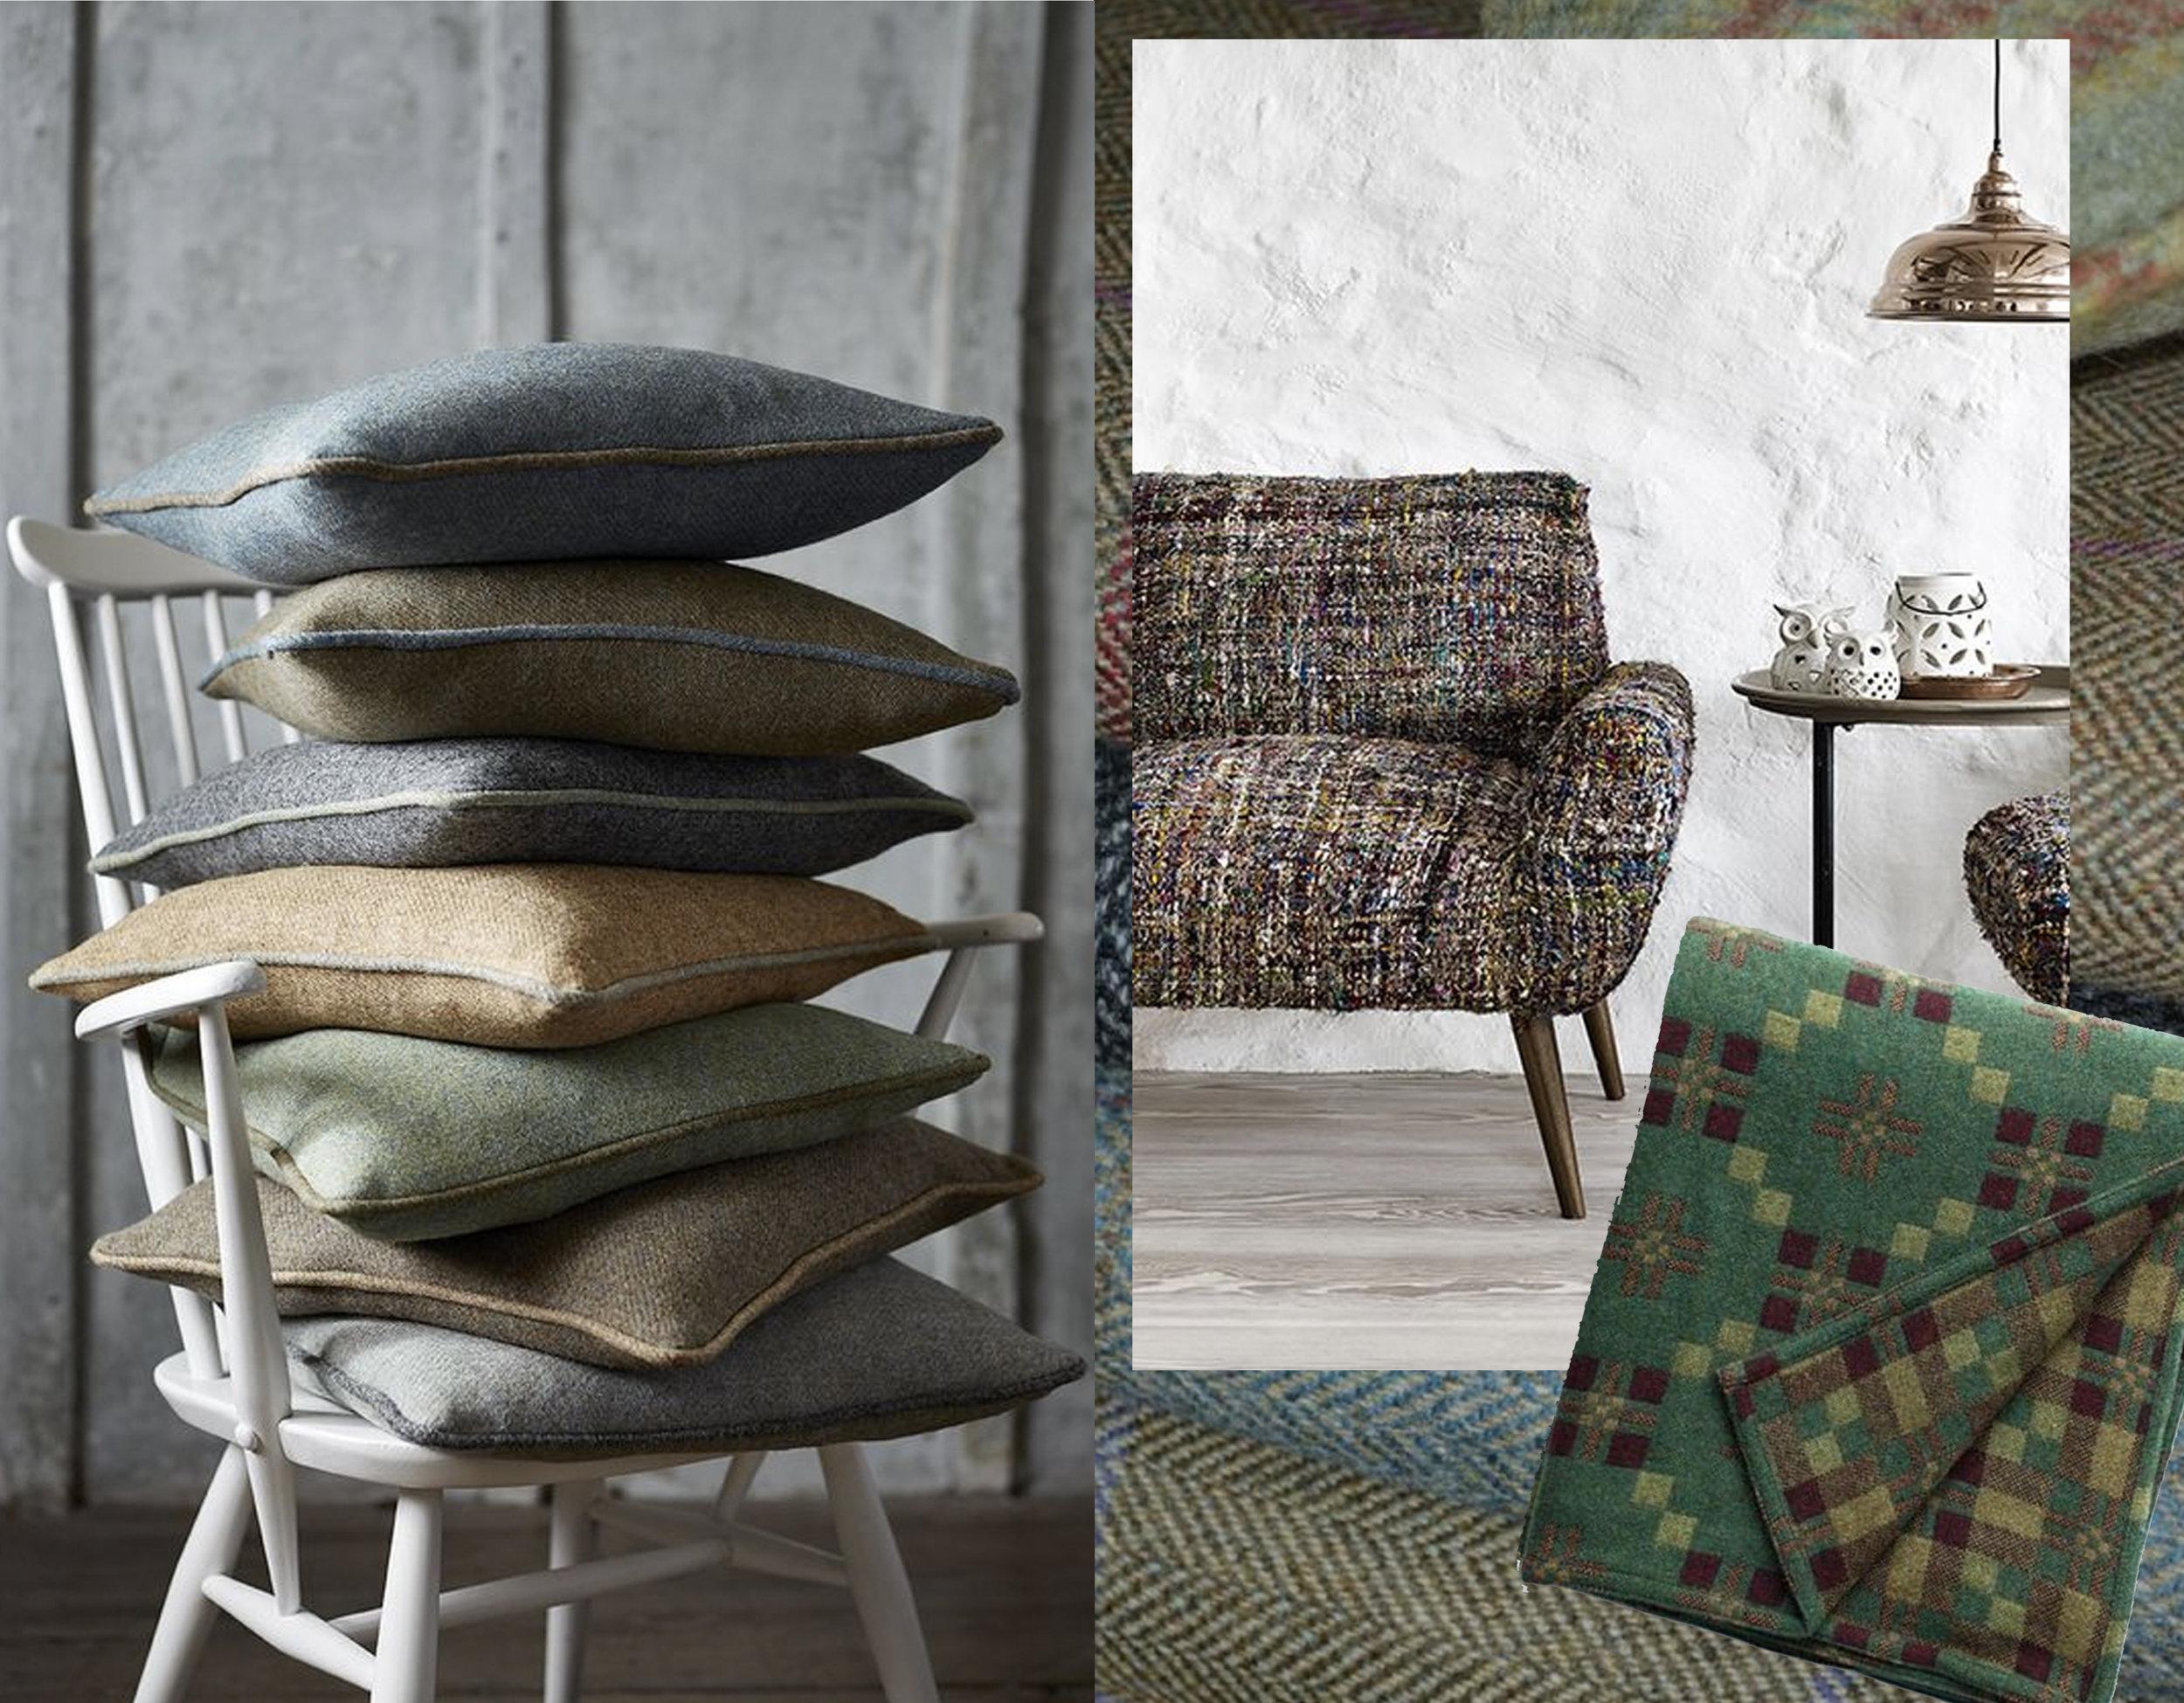 pile of pillows via  Interior Decor Trends  - sofa with tweed fabric via  Trendspananrna  - St. Davids Cross Throw  Another Country